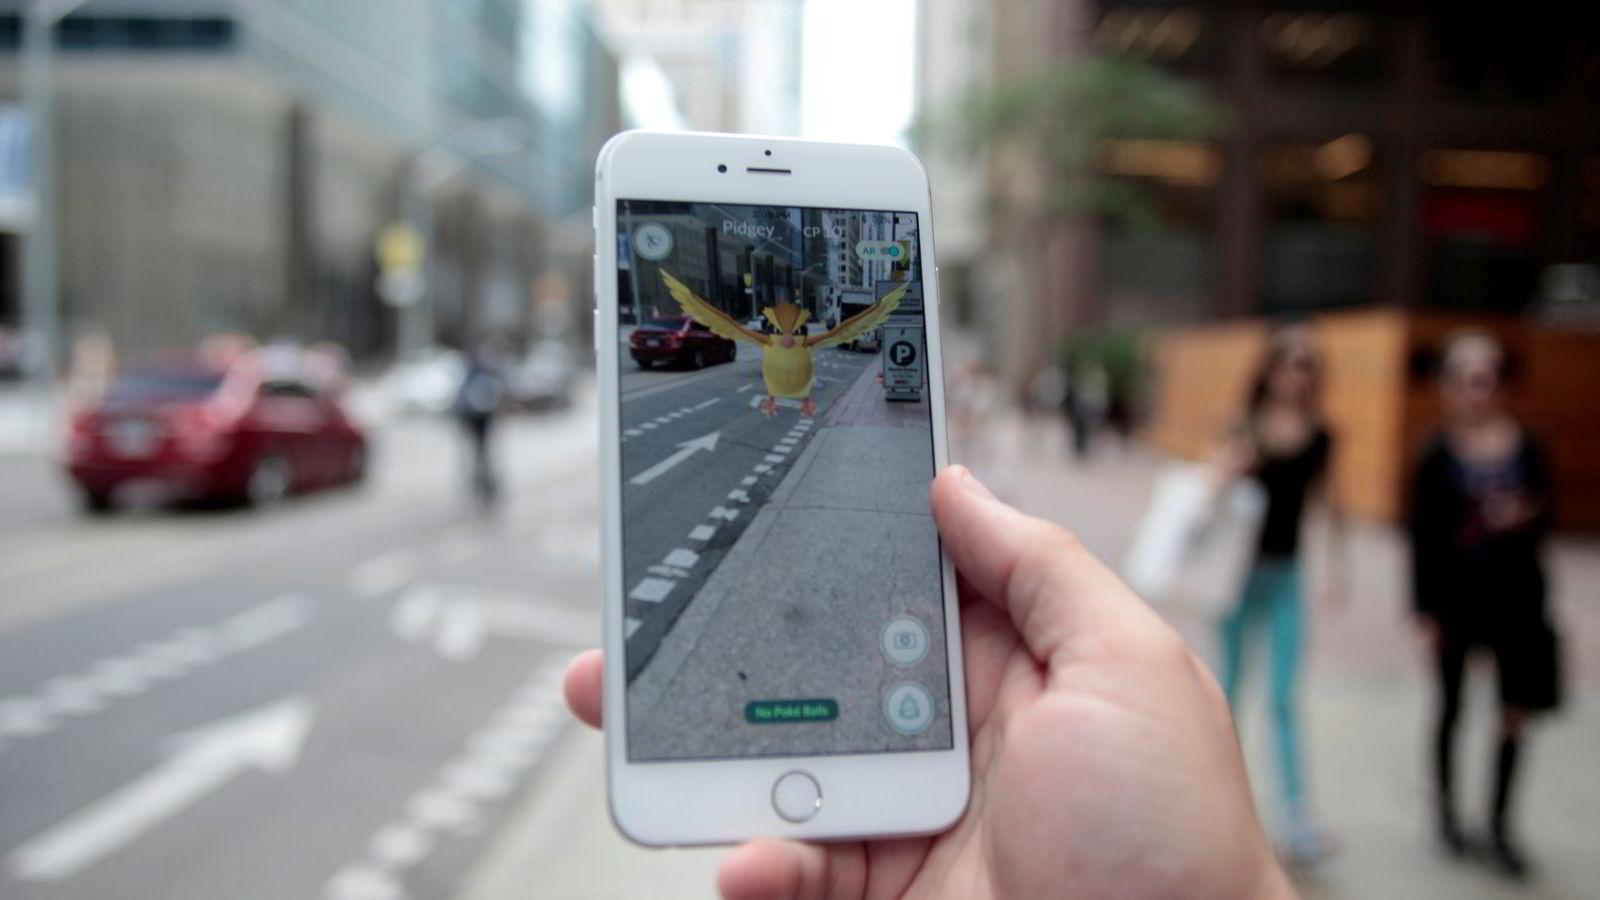 Ontario, 11. juli 2016: En «Pidgey» Pokémon dukker opp i trafikken i Ontario. Foto: NTB Scanpix/REUTERS/Chris Helgren